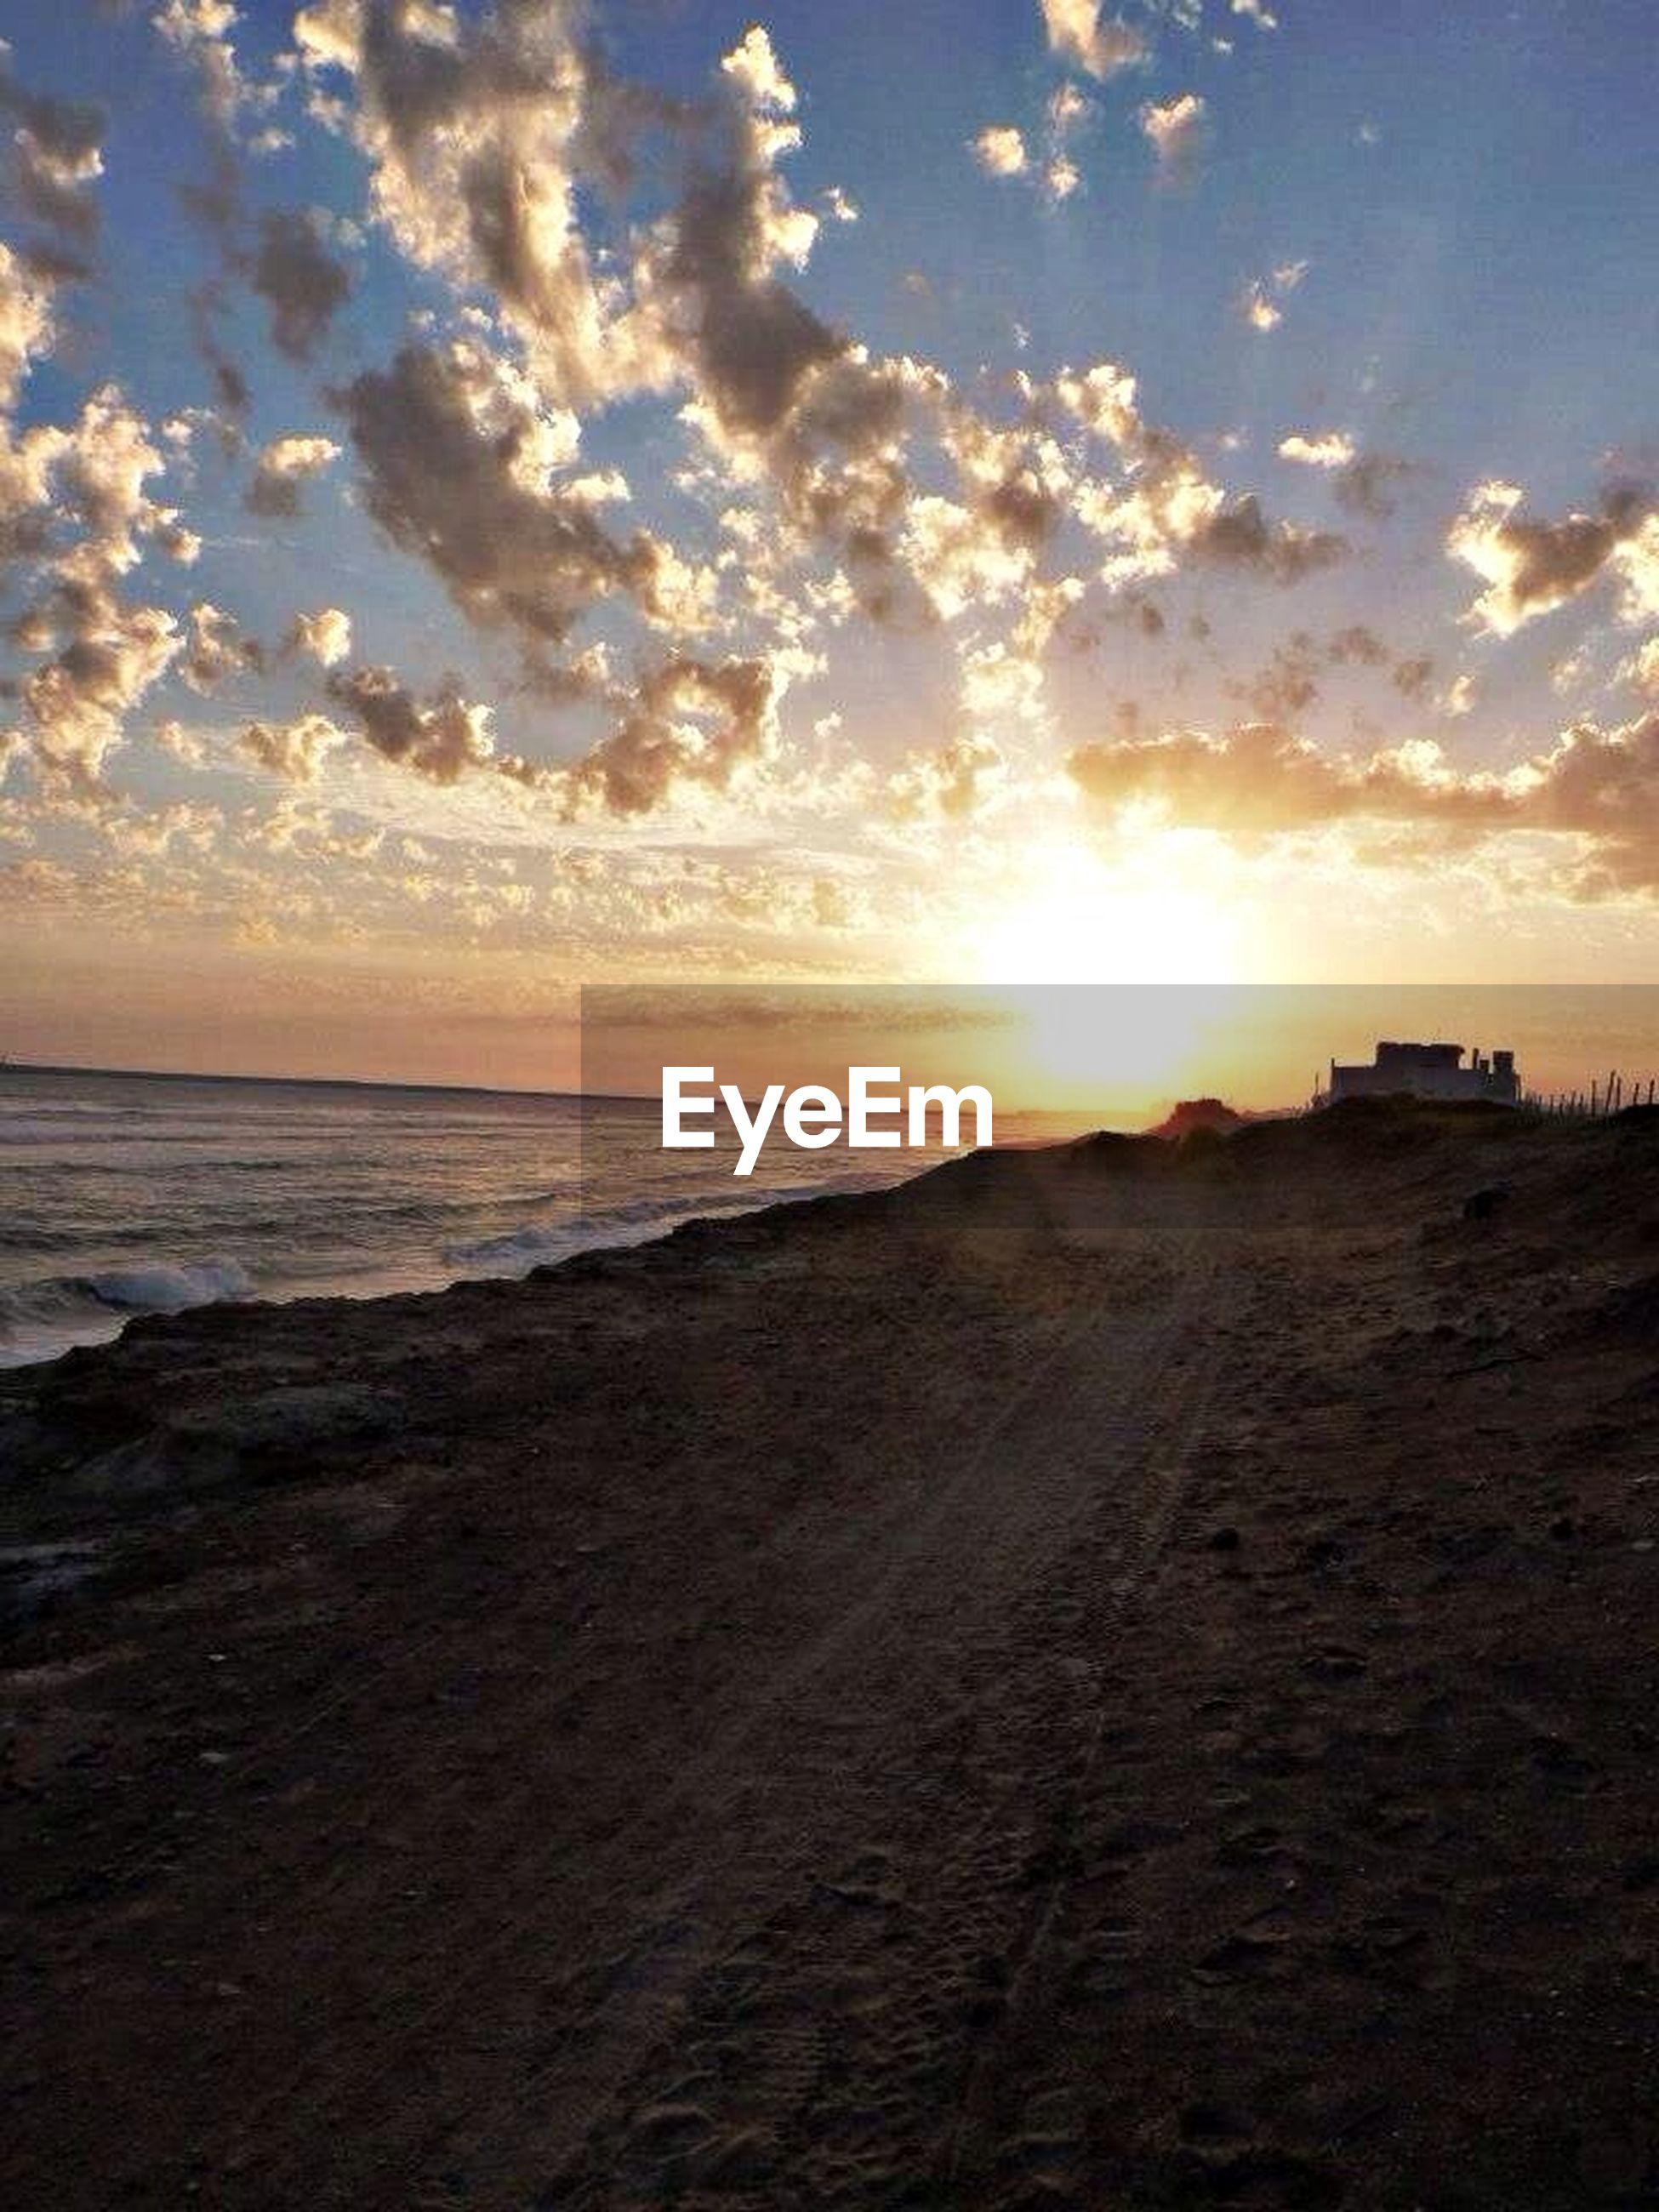 sea, beach, sunset, horizon over water, water, sun, sky, shore, scenics, tranquil scene, beauty in nature, sand, tranquility, sunlight, cloud - sky, sunbeam, nature, idyllic, wave, coastline